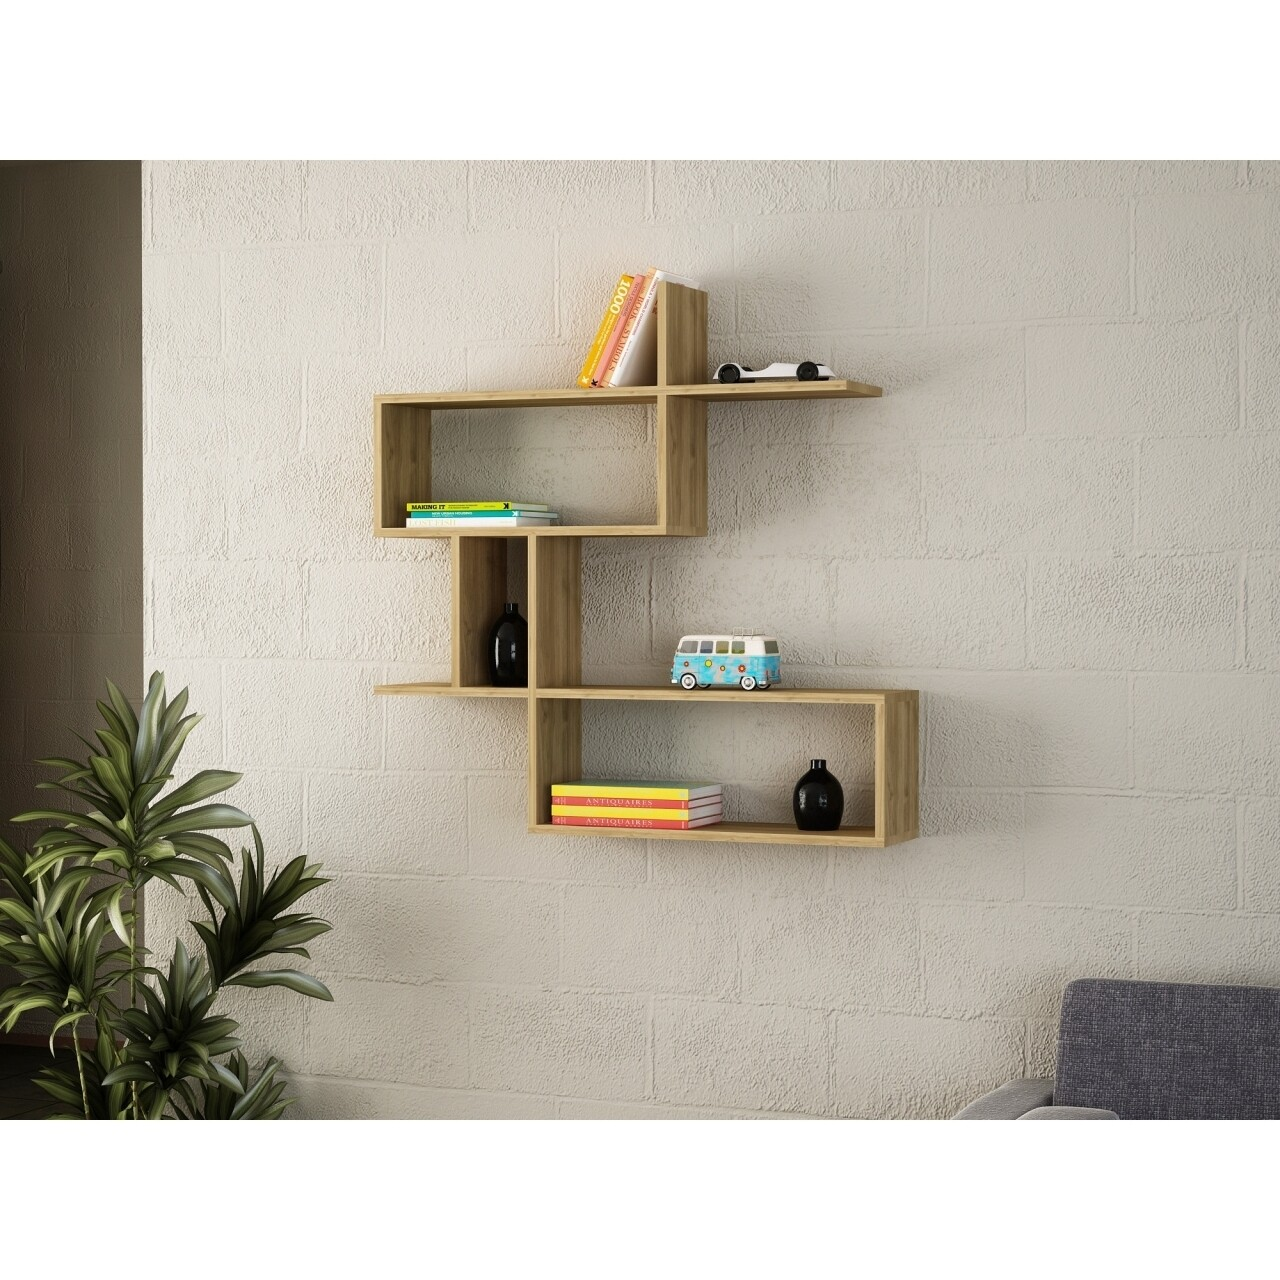 Raft pentru perete, Wooden Art, Montera Walnut, 100x107.2x22 cm